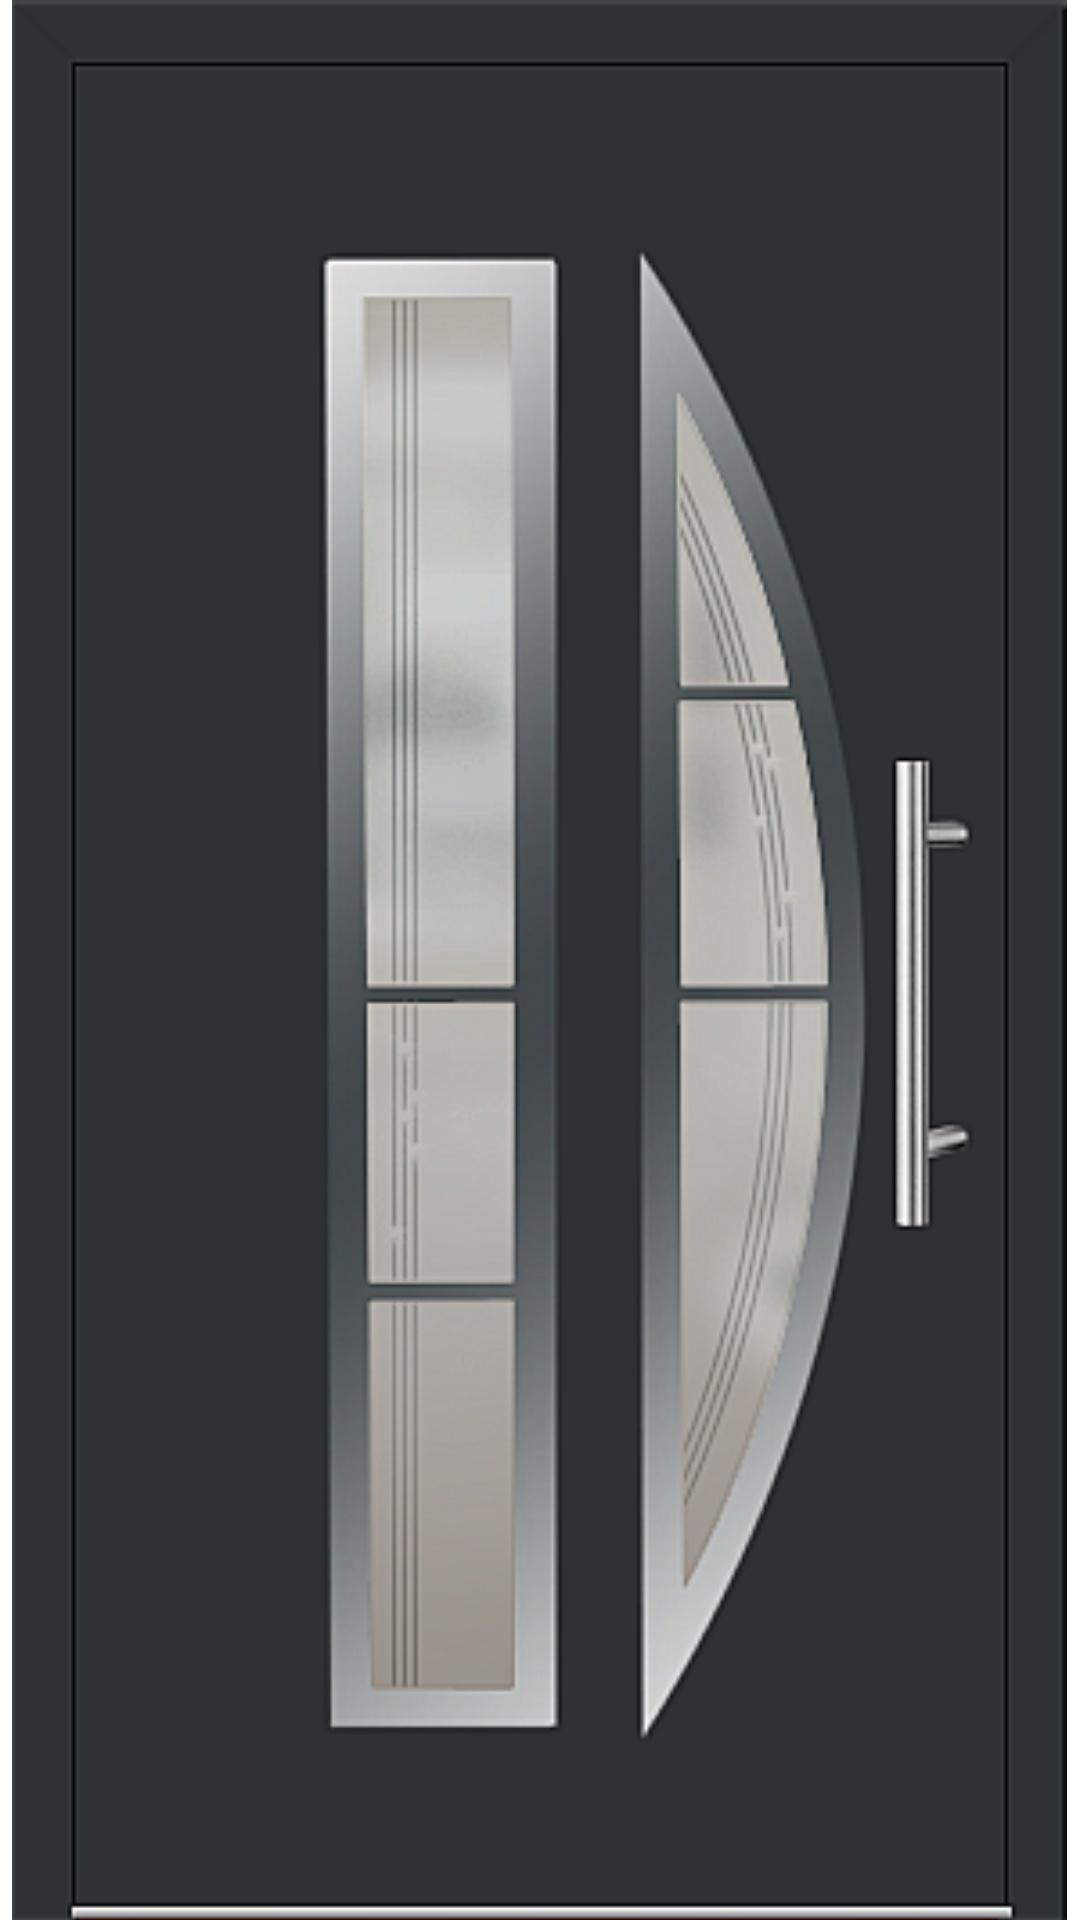 Aluminium Haustür Modell 6525-75 schwarz